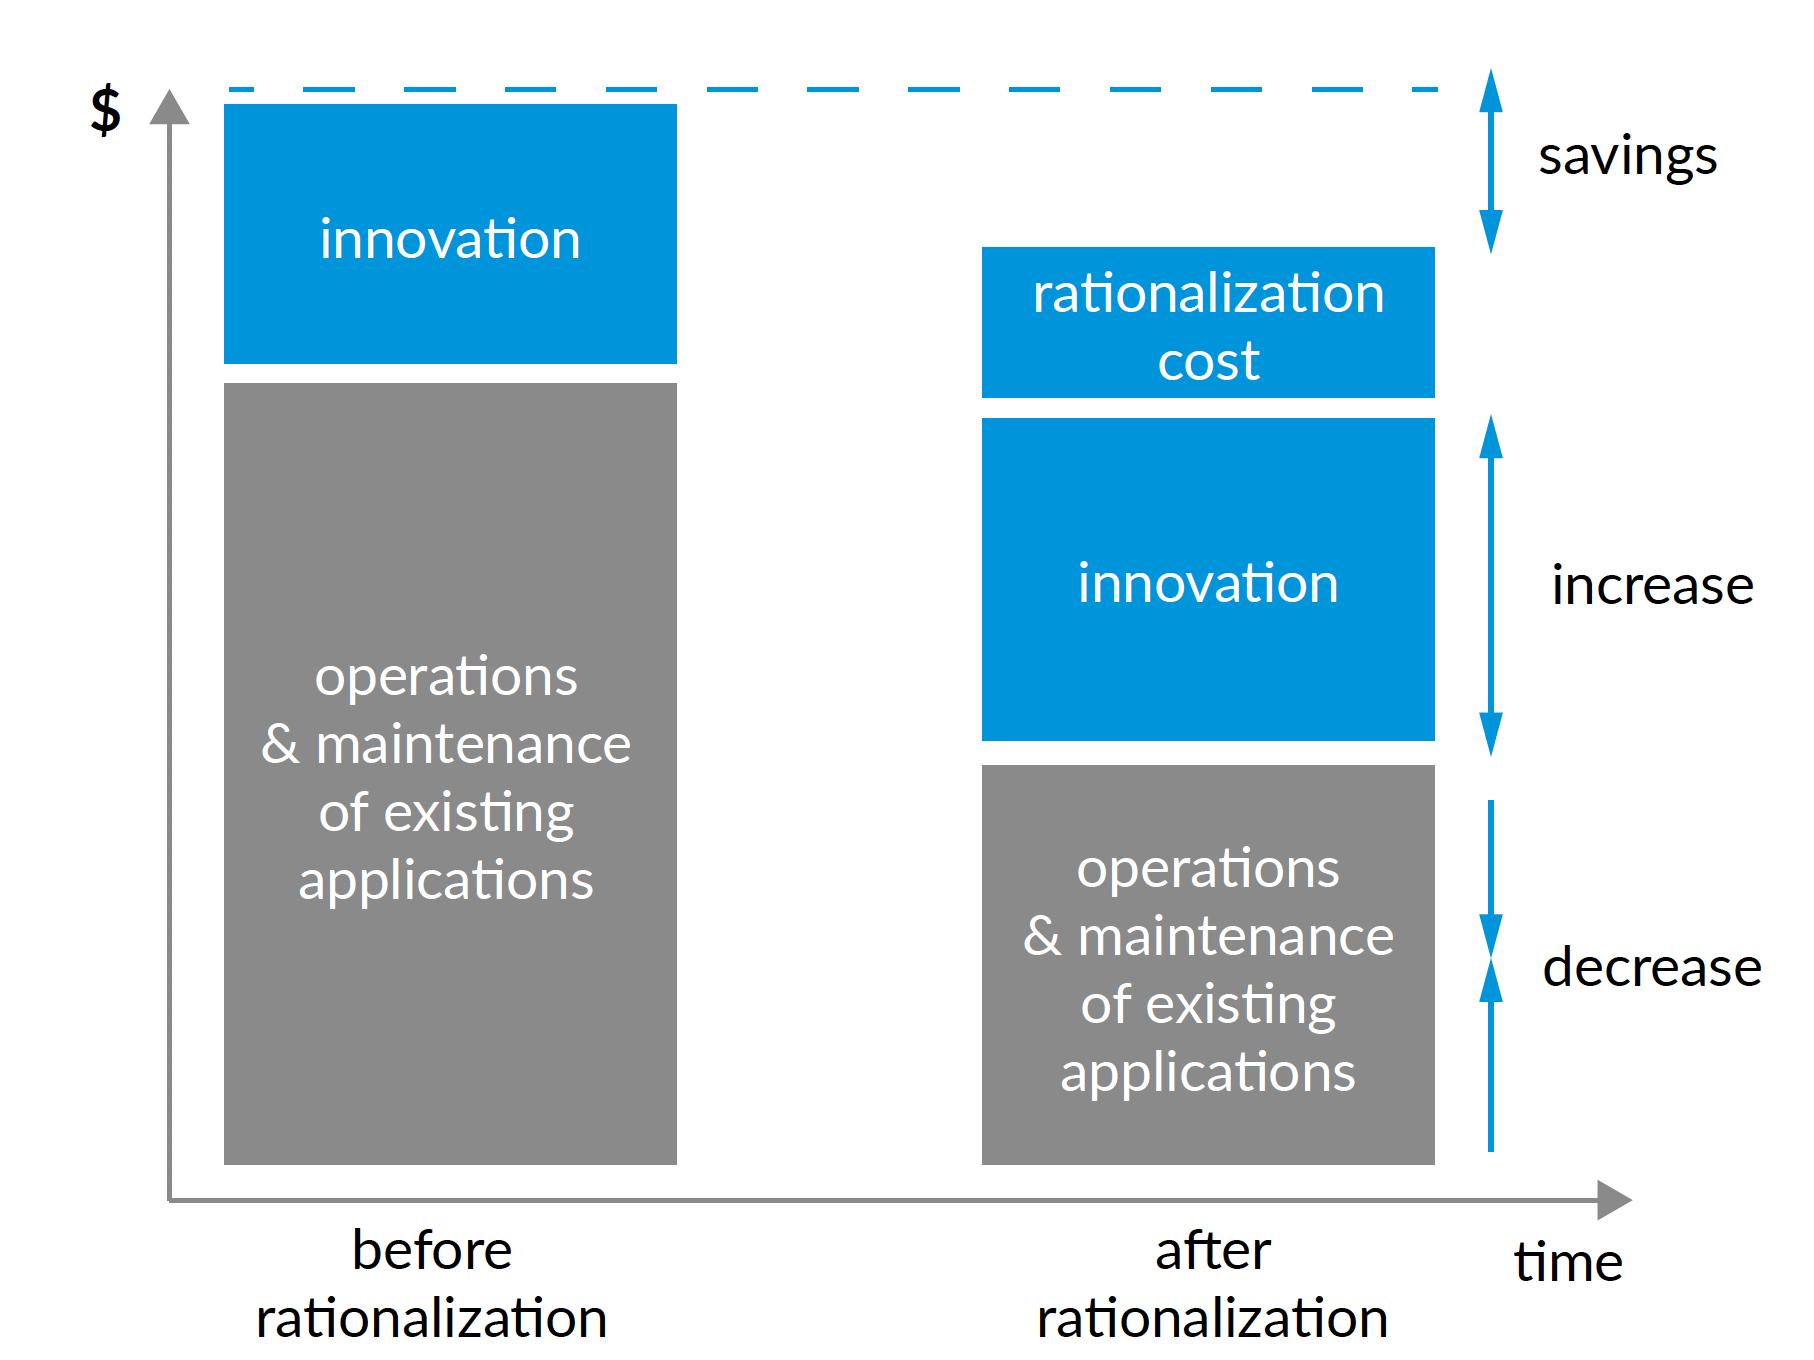 financial mechanics of application rationalization